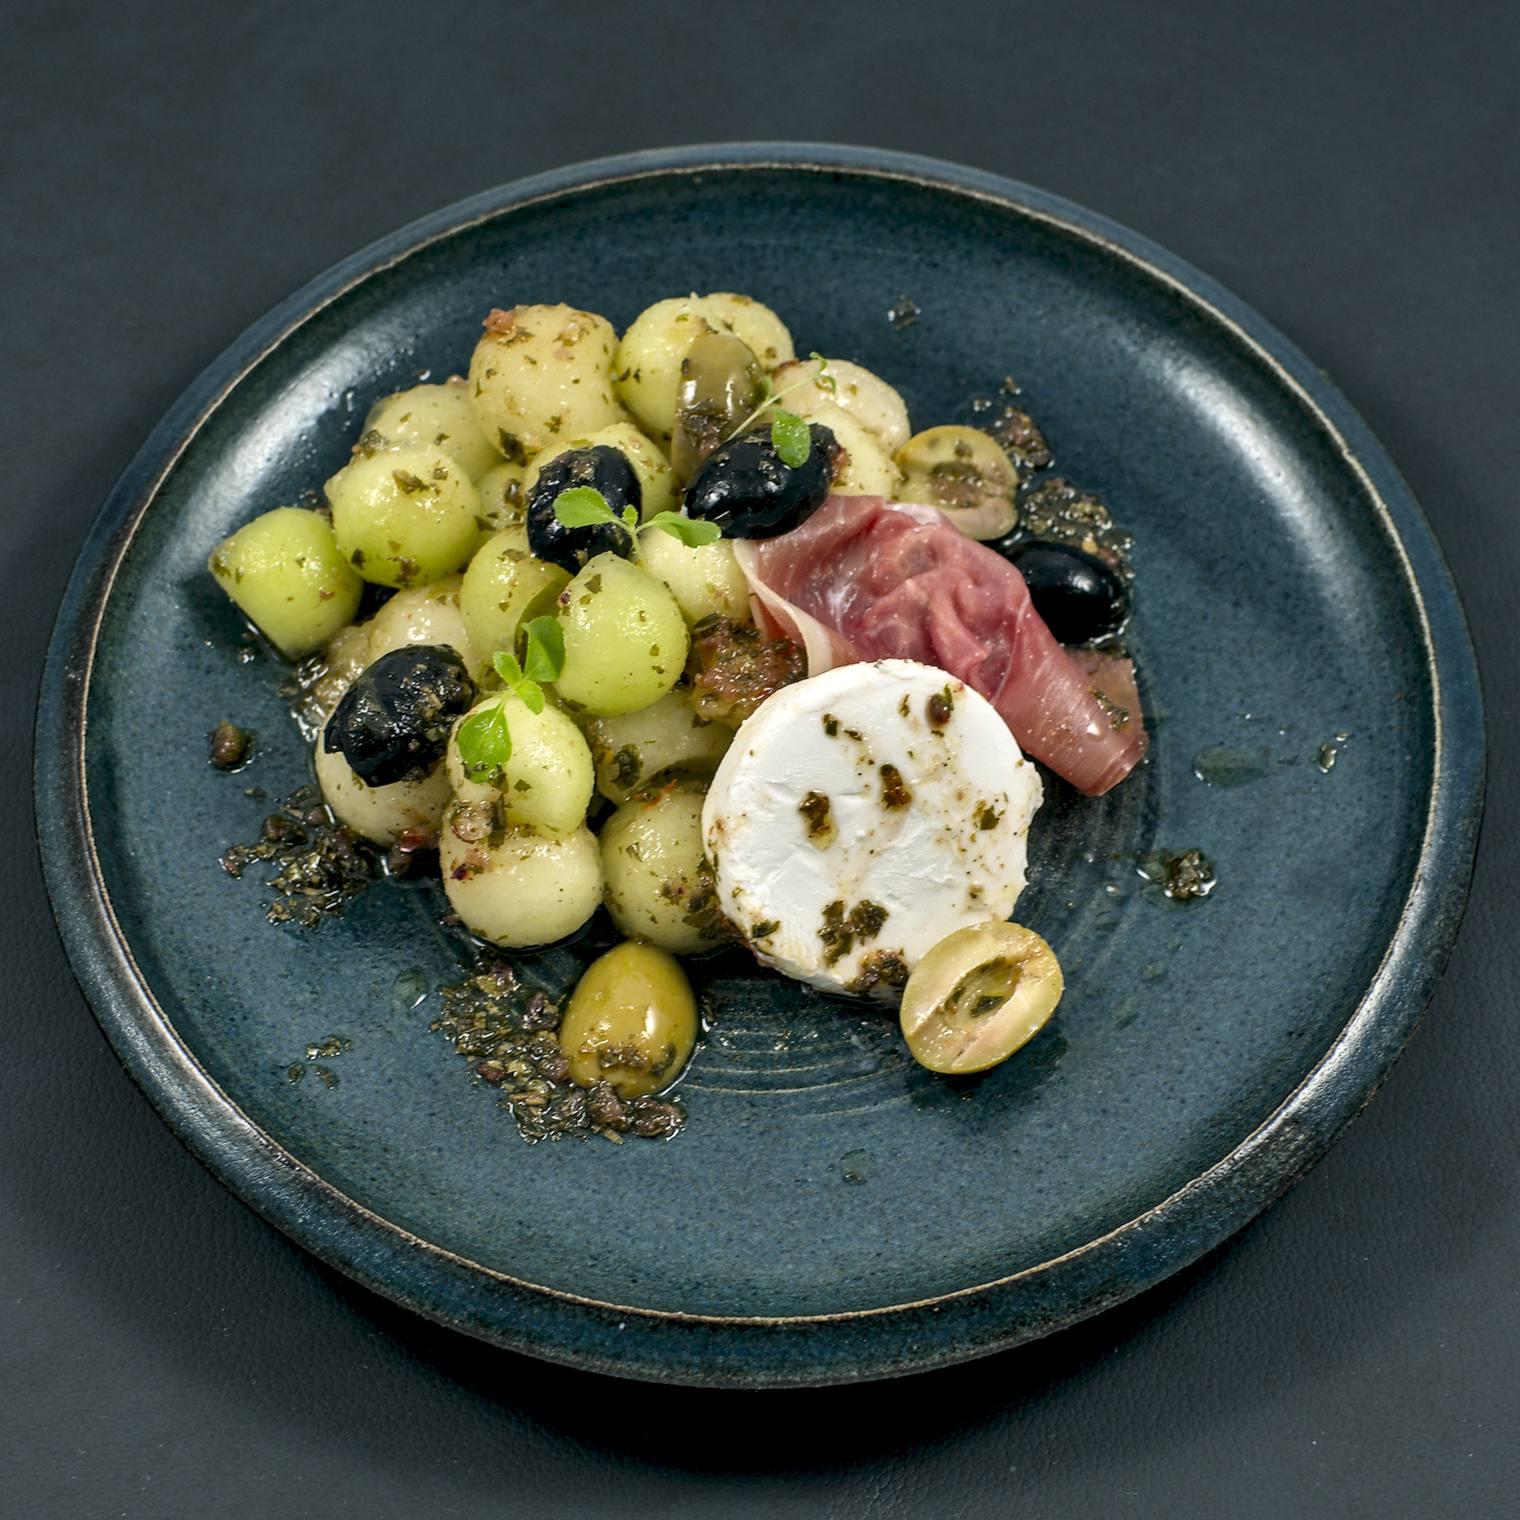 Melonensalat | Serrano-Schinken | Ziegenfrischkäse